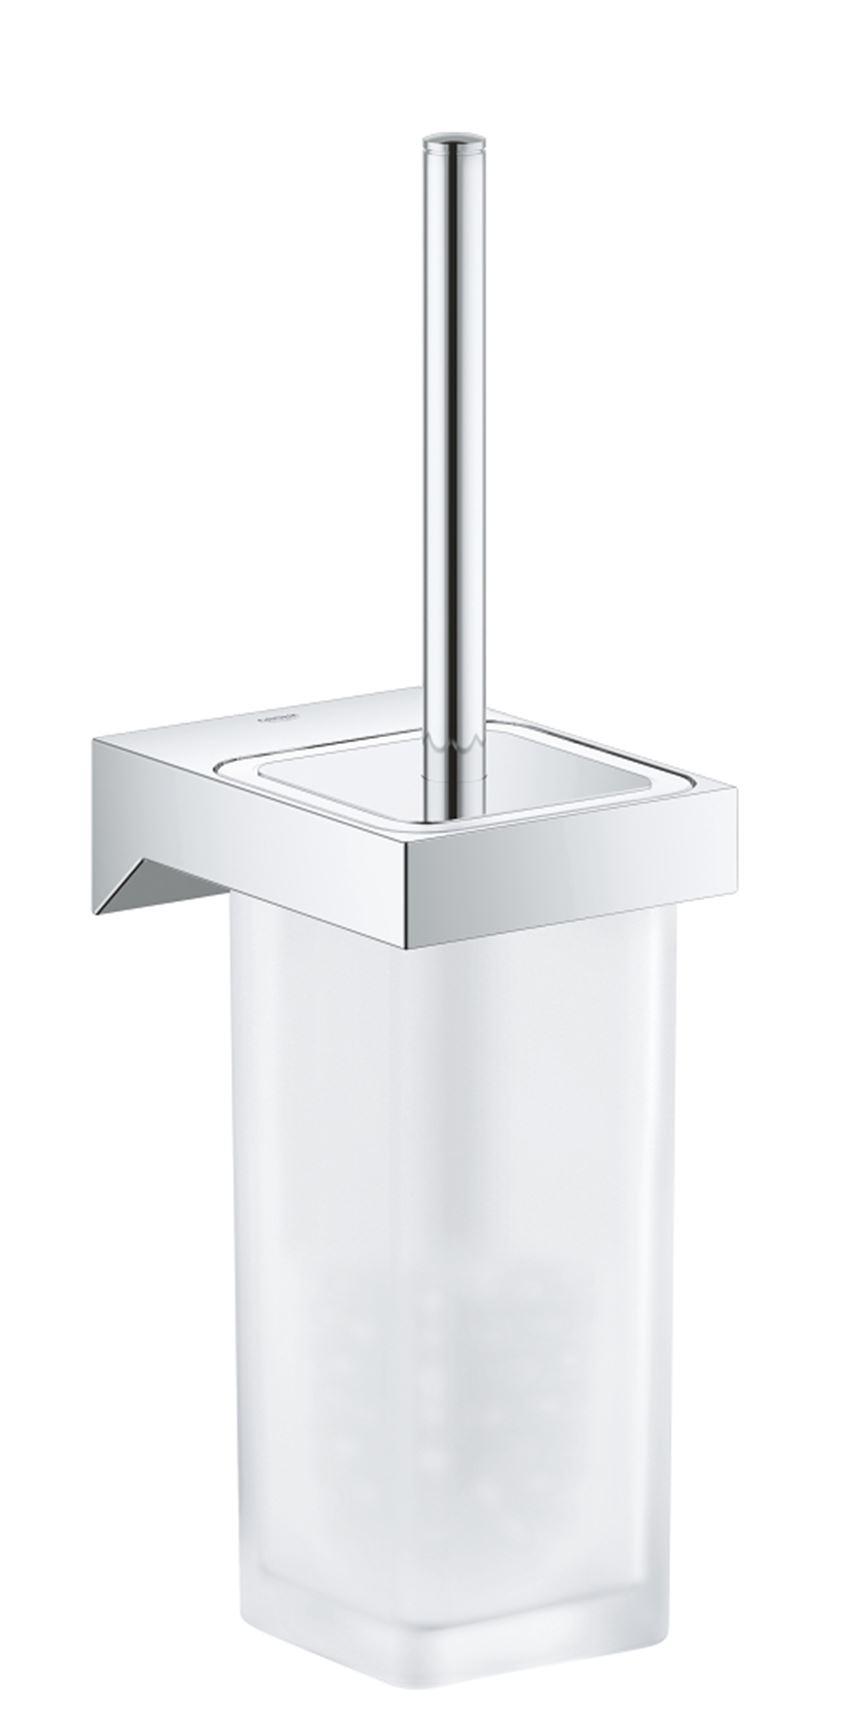 Szczotka do WC chromowana Grohe Selection Cube